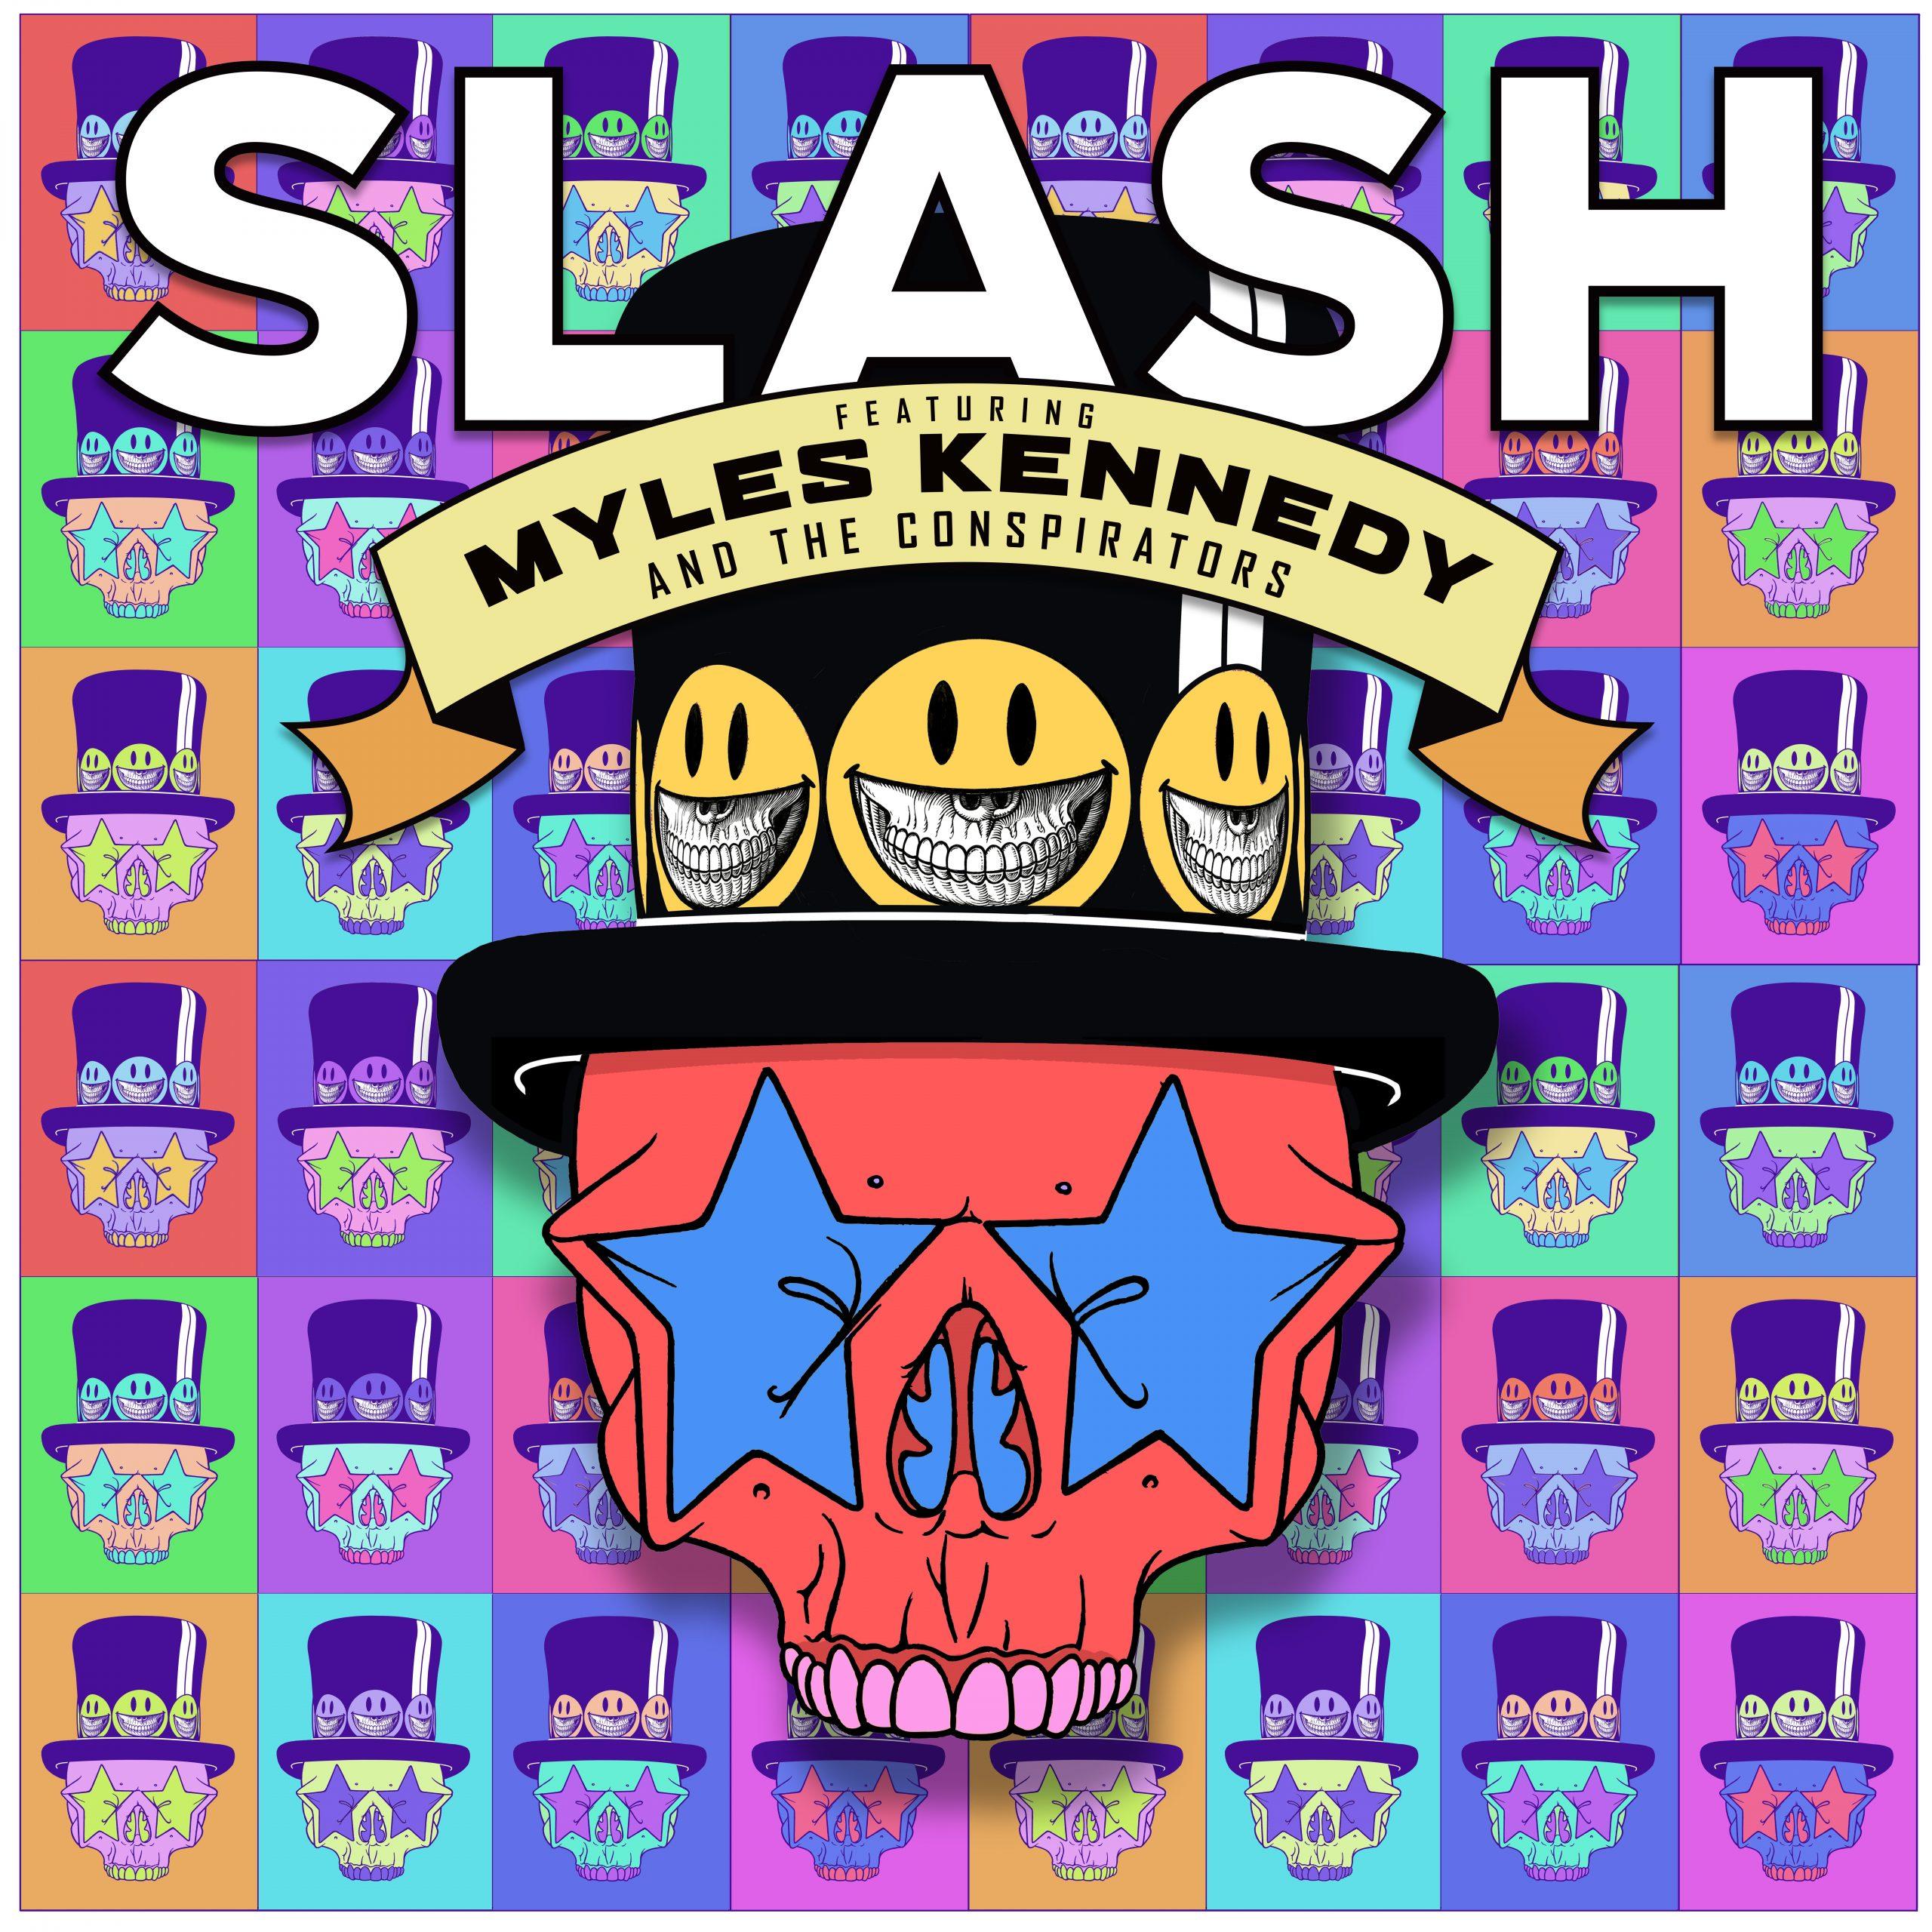 Slash featuring Myles Kennedy & The Conspirators - Driving Rain